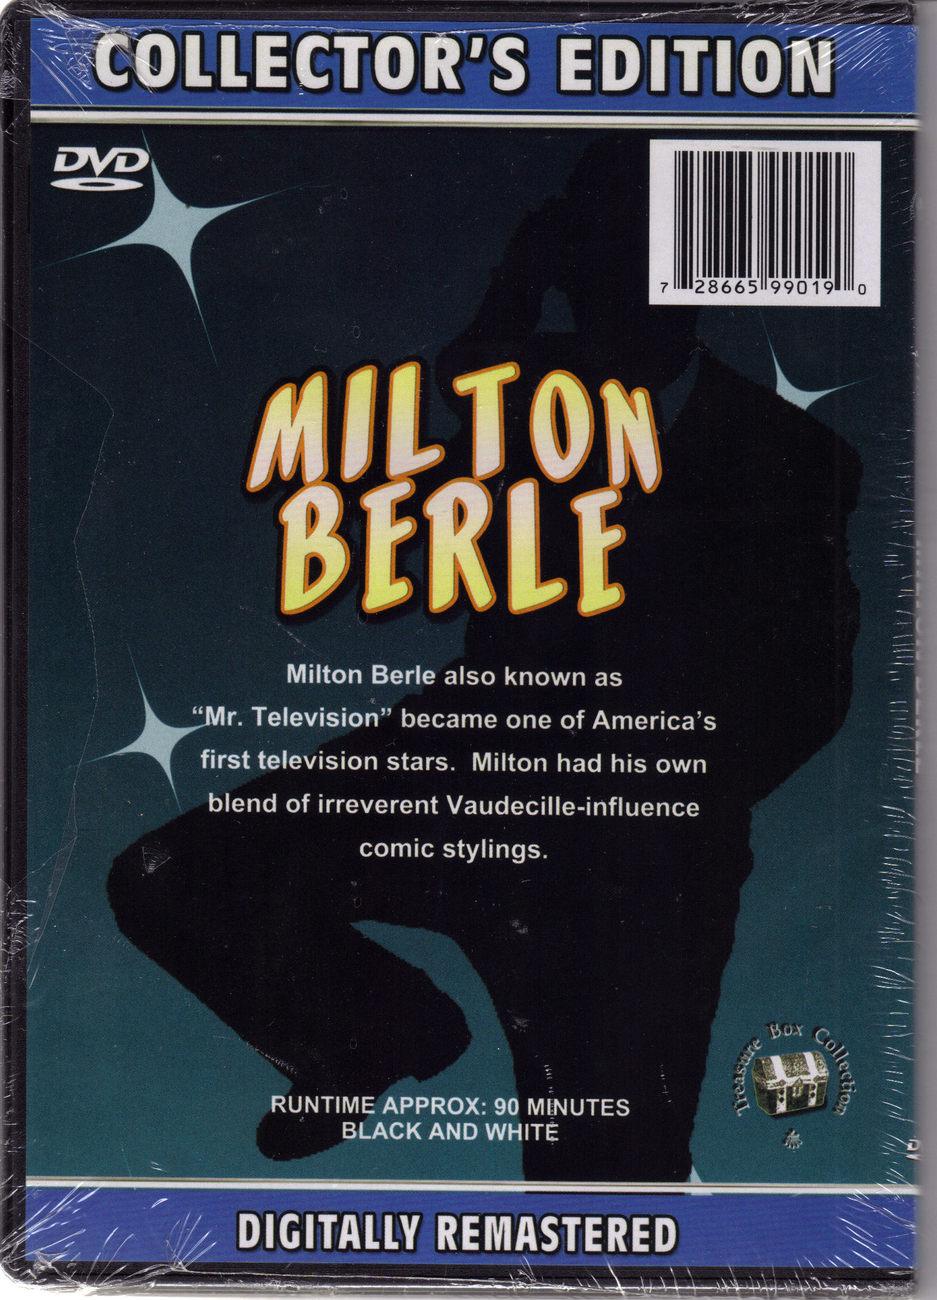 MILTON BERLE DVD Collectors Edition